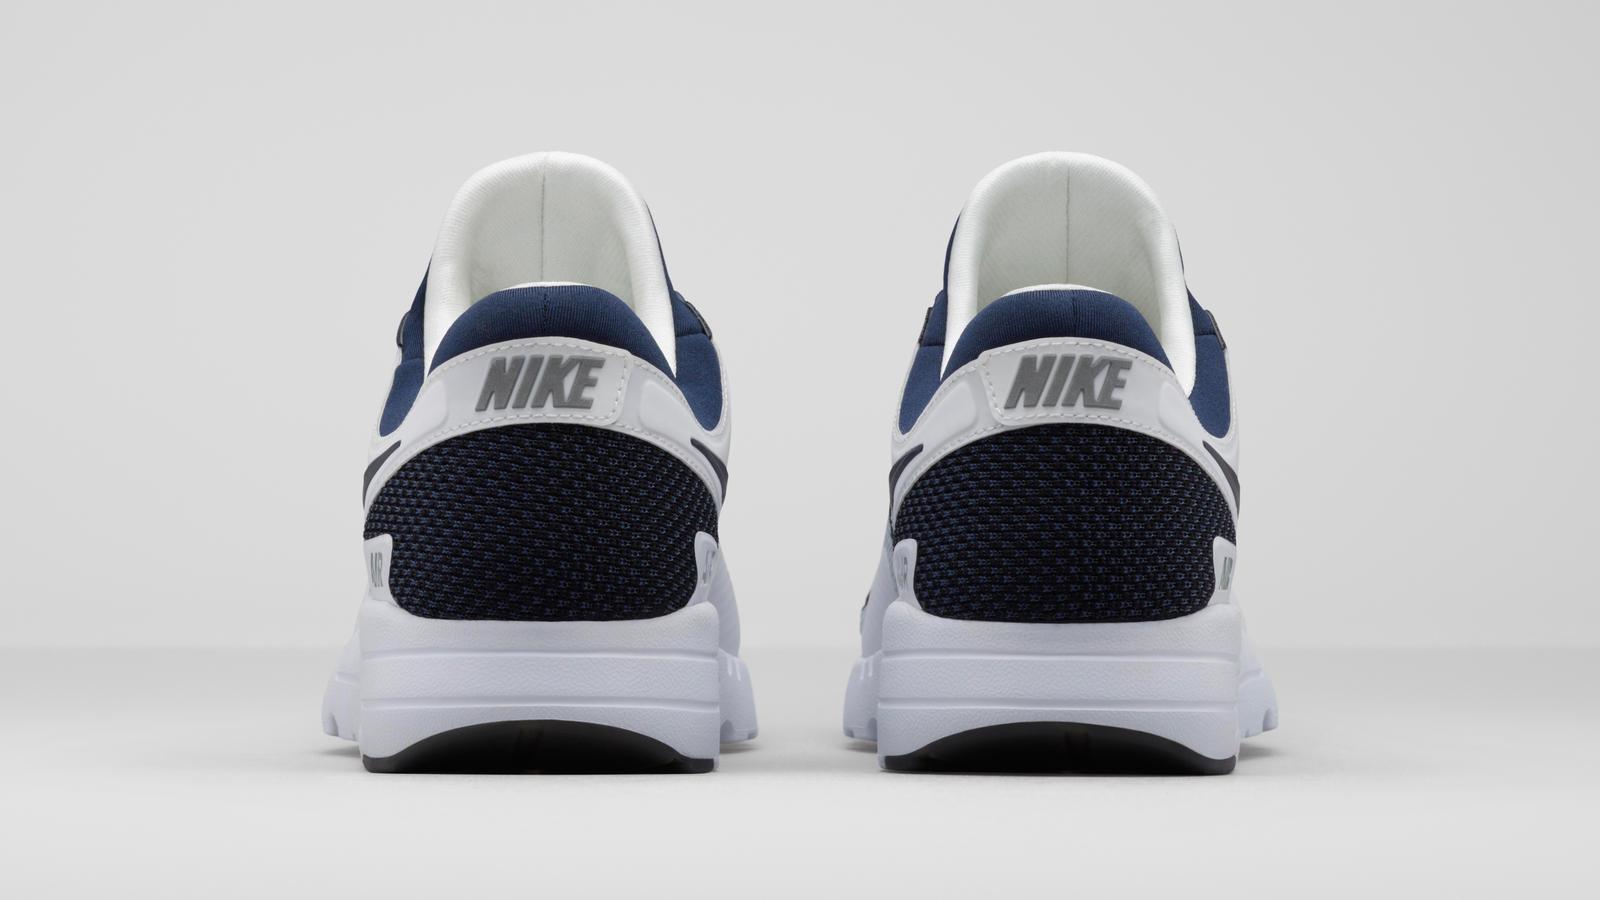 Nike Air Max 2015 Homme Prix